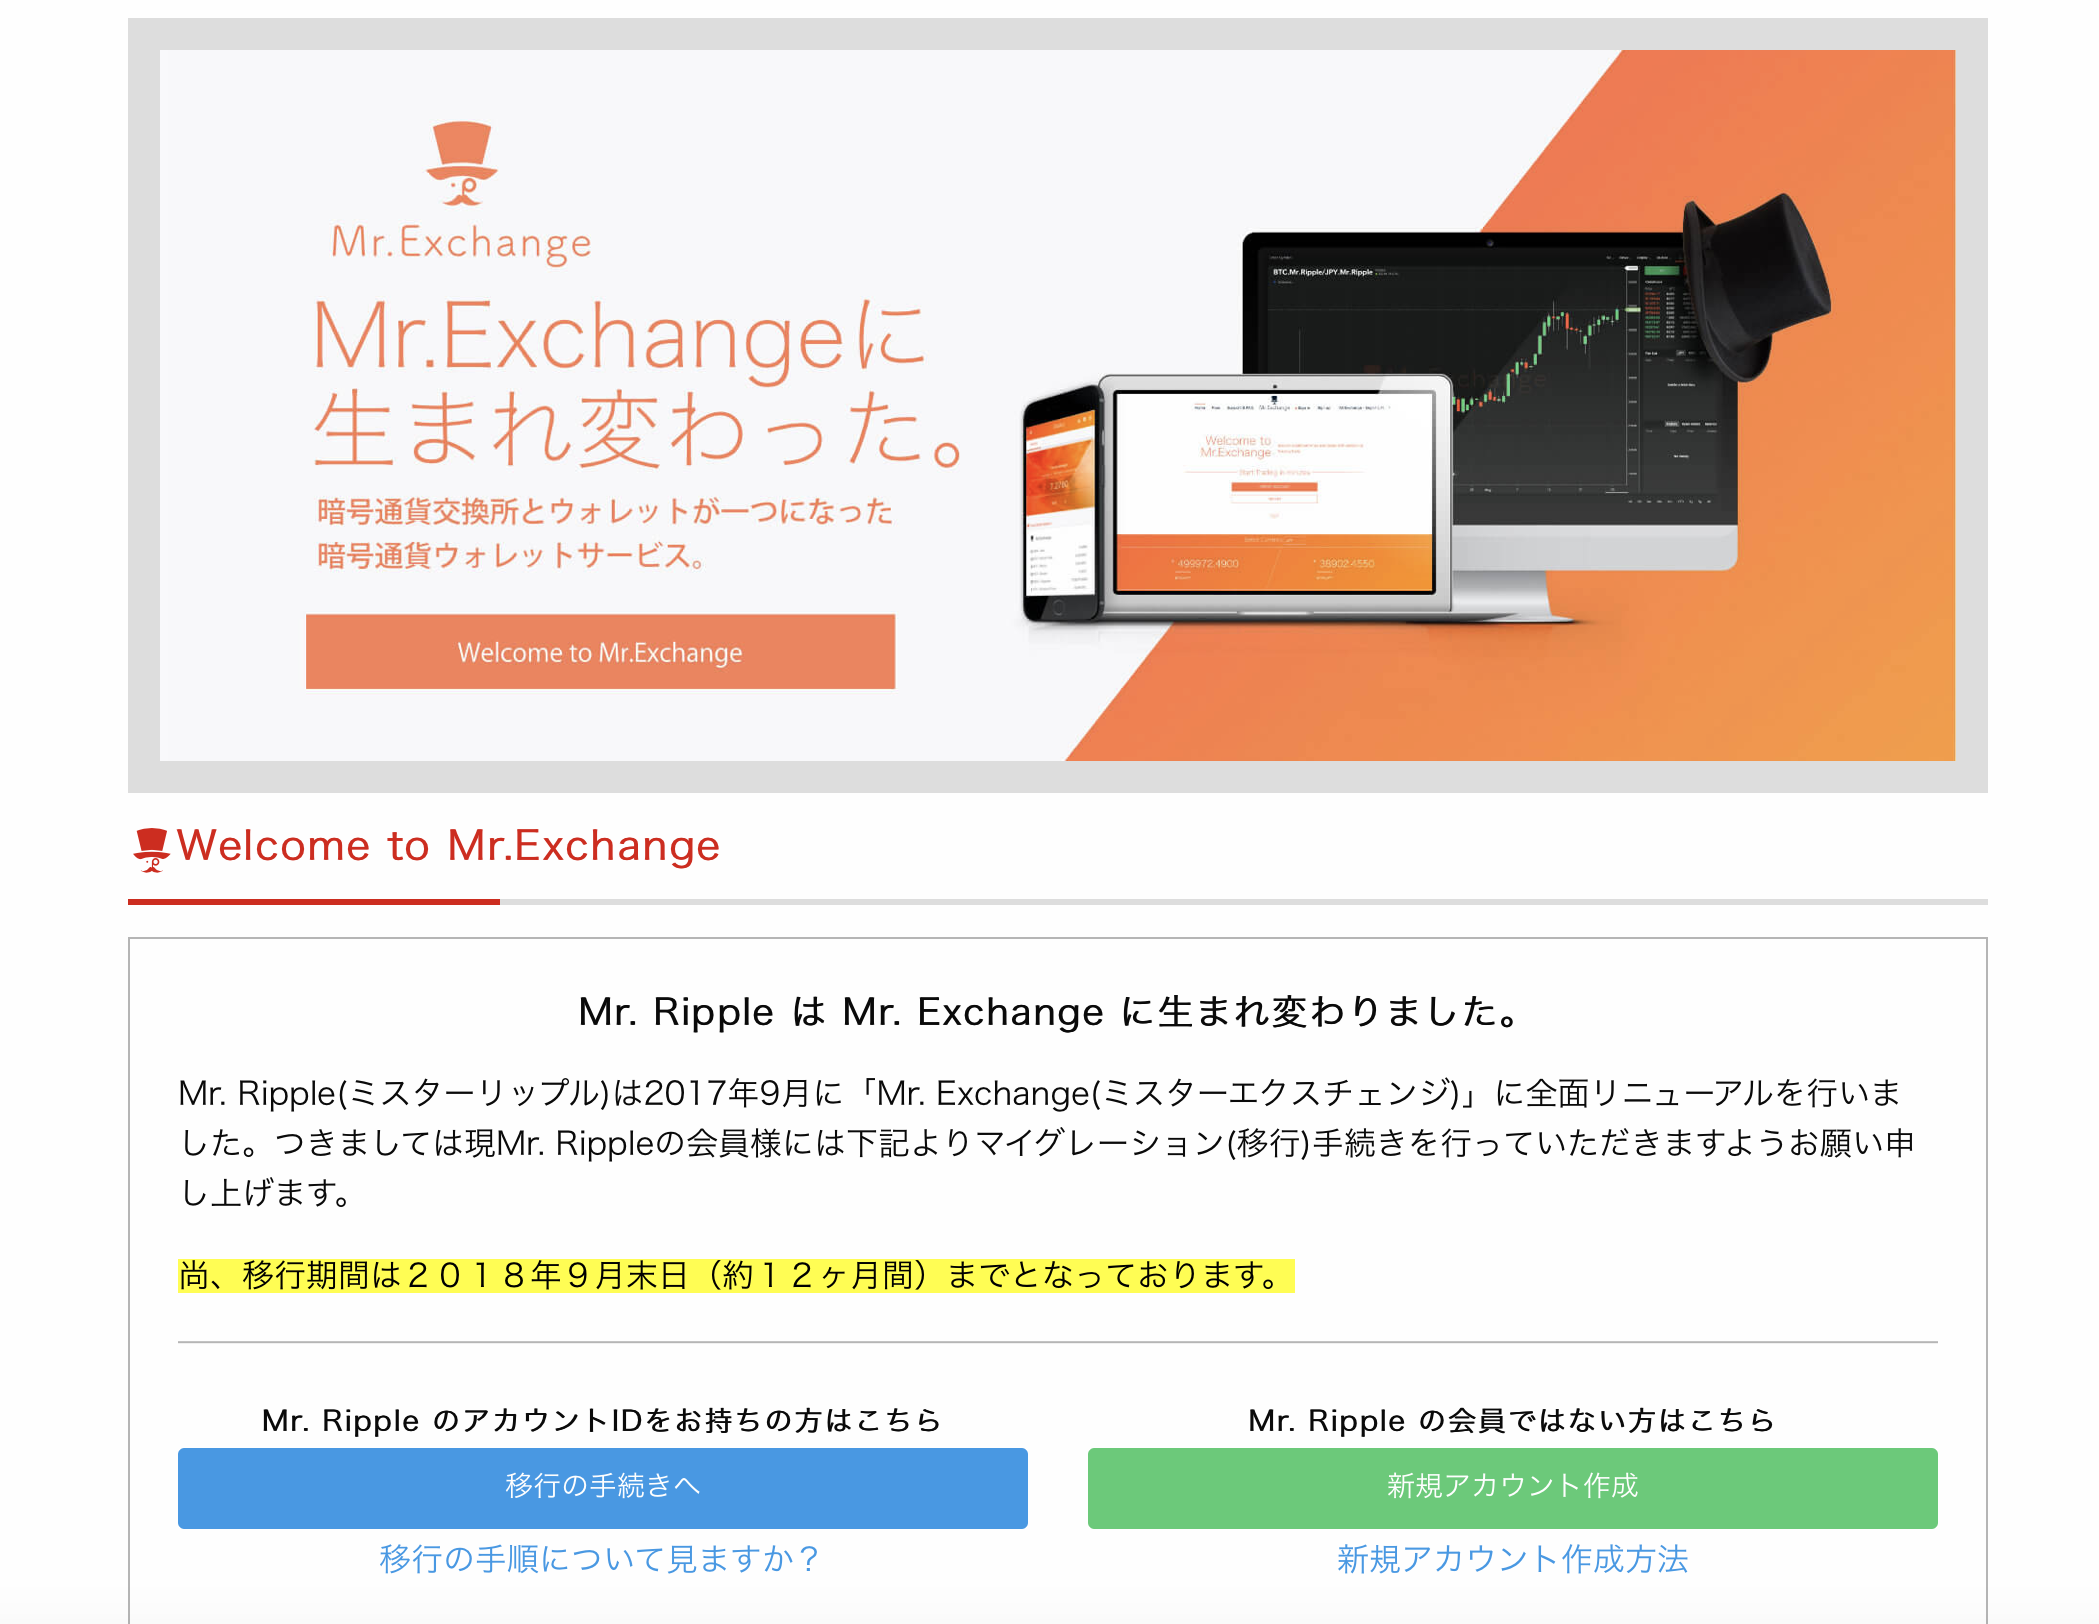 Mr. Exchange